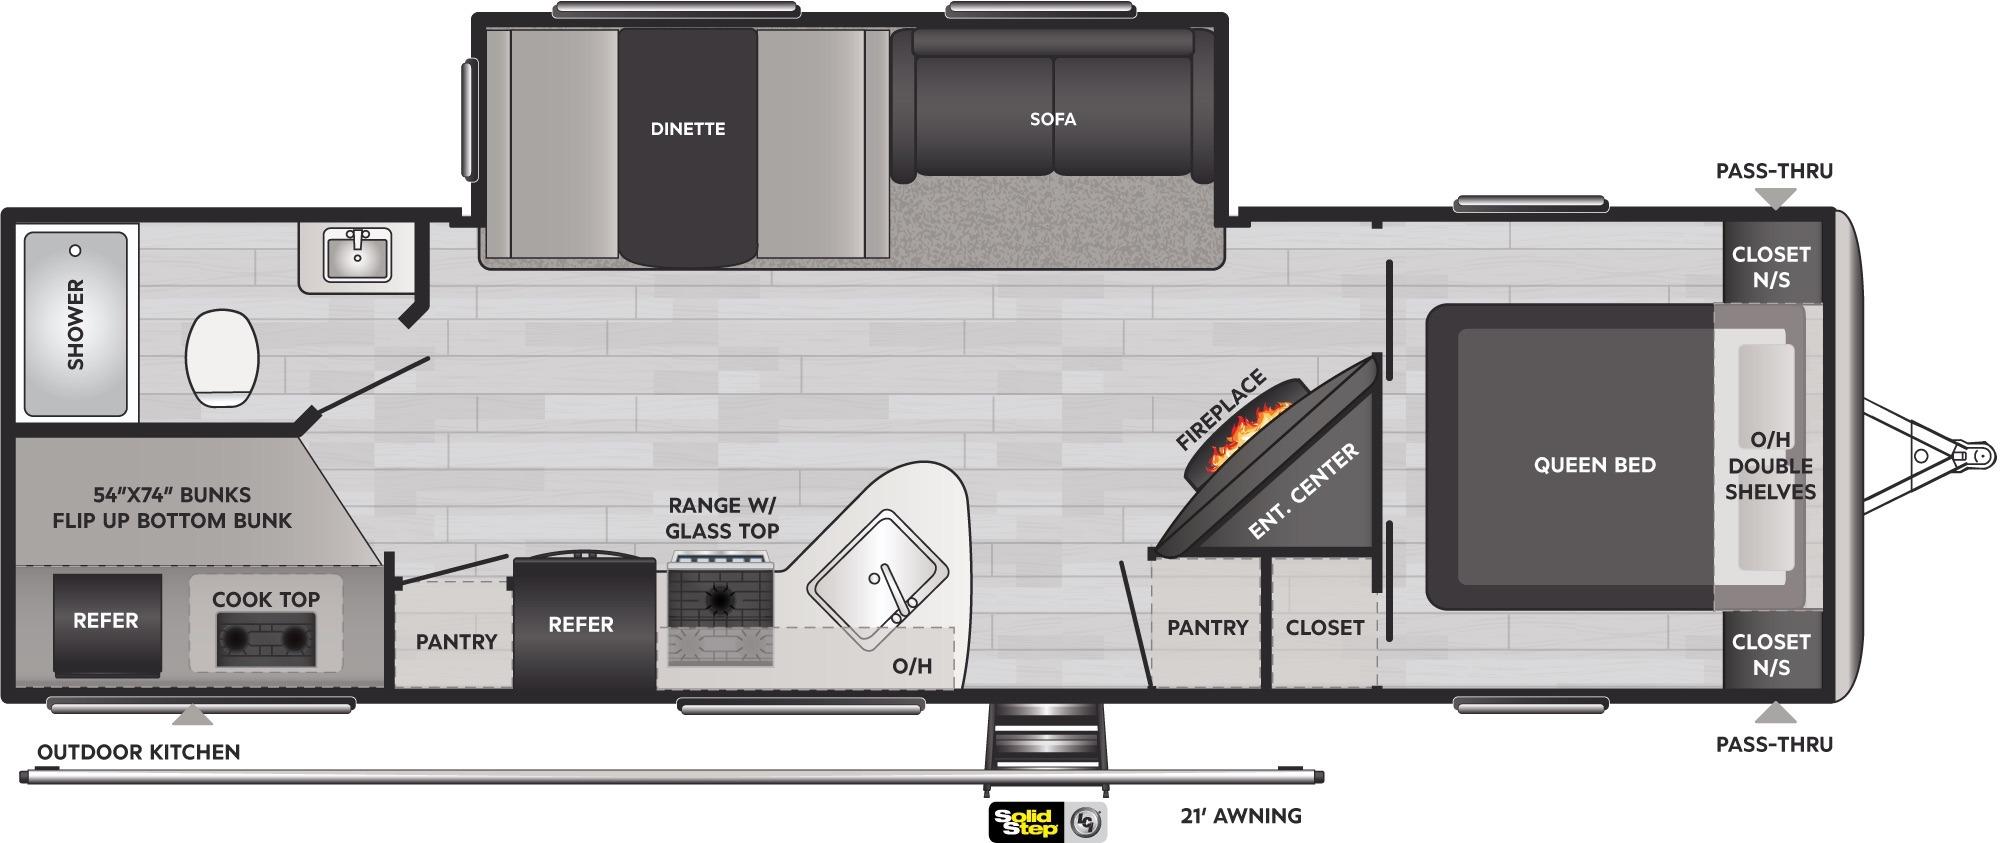 View Floor Plan for 2022 KEYSTONE SPRINGDALE 295BH